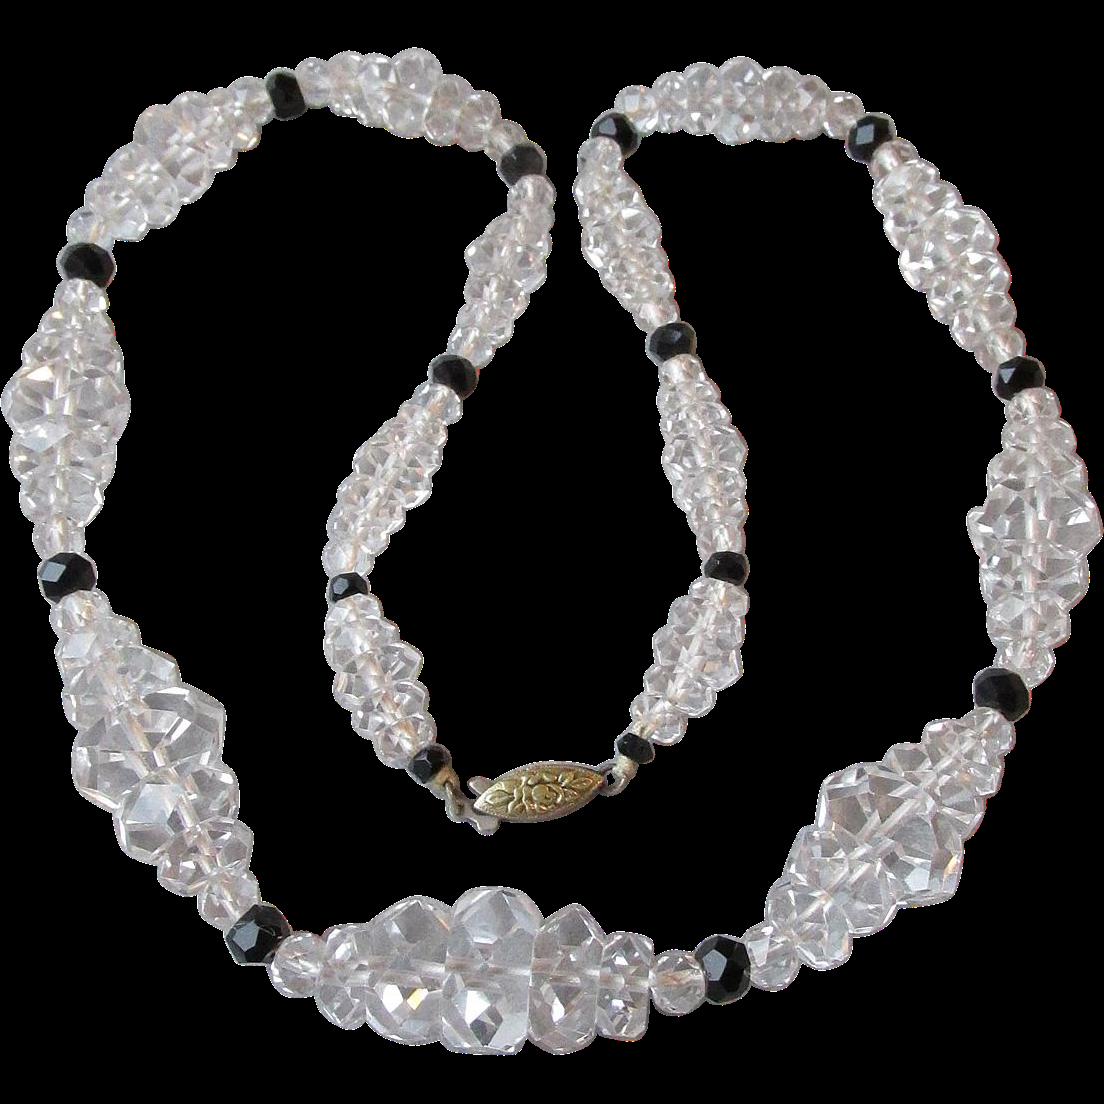 1930's Vintage Art Deco Rock Crystal Quartz Graduated Bead Necklace